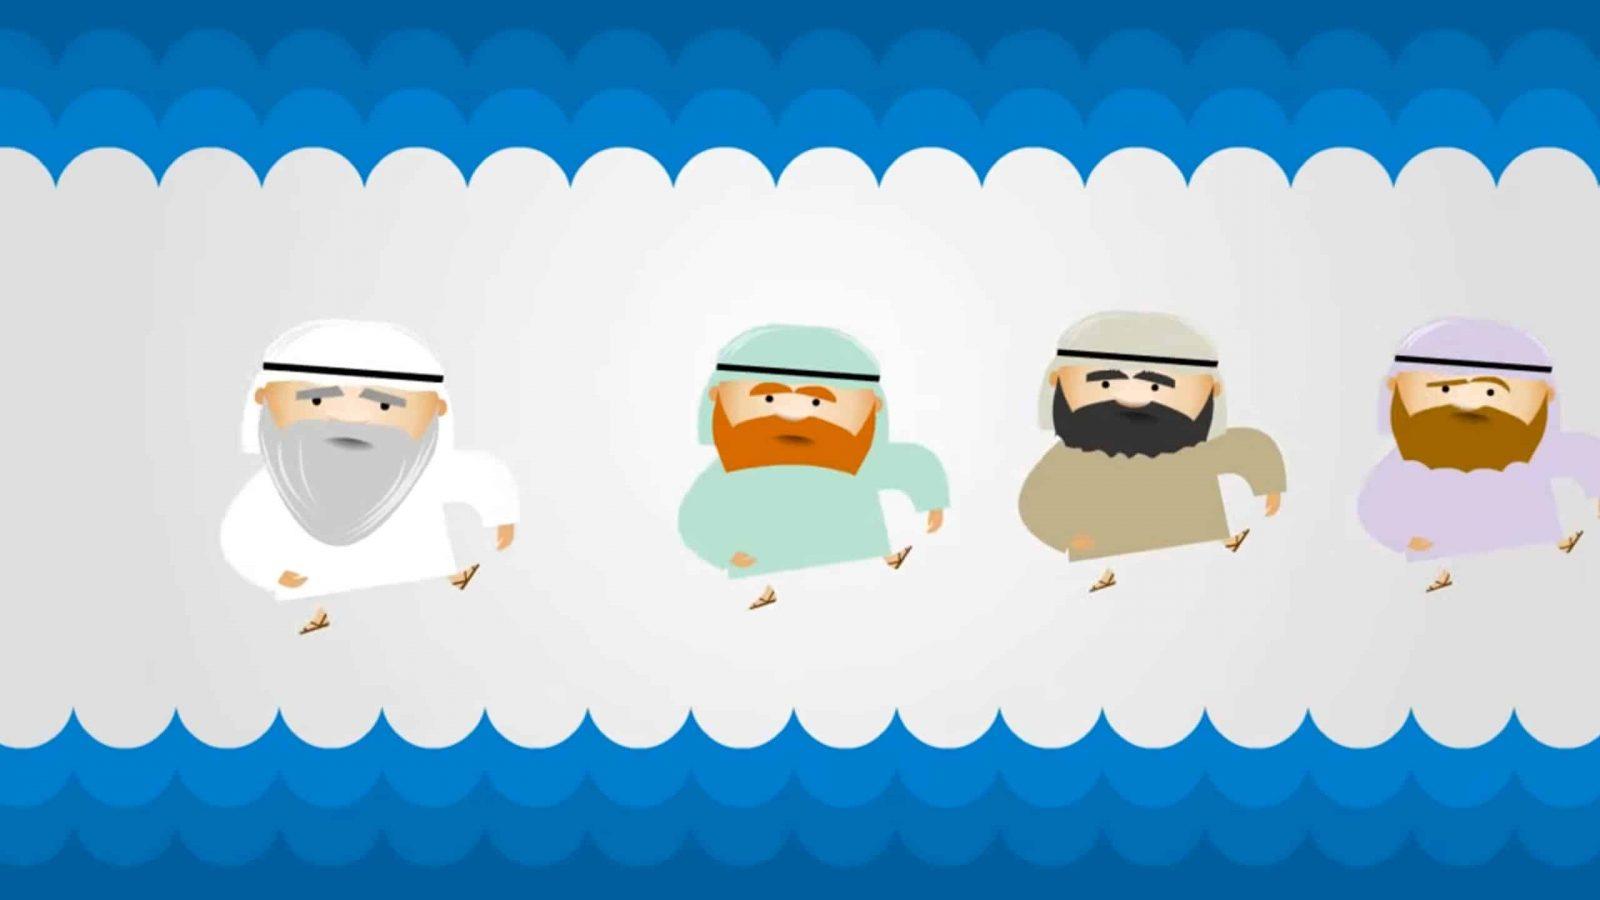 Web3D - מיתוג עסקי - אנימציה של אגדת פסח